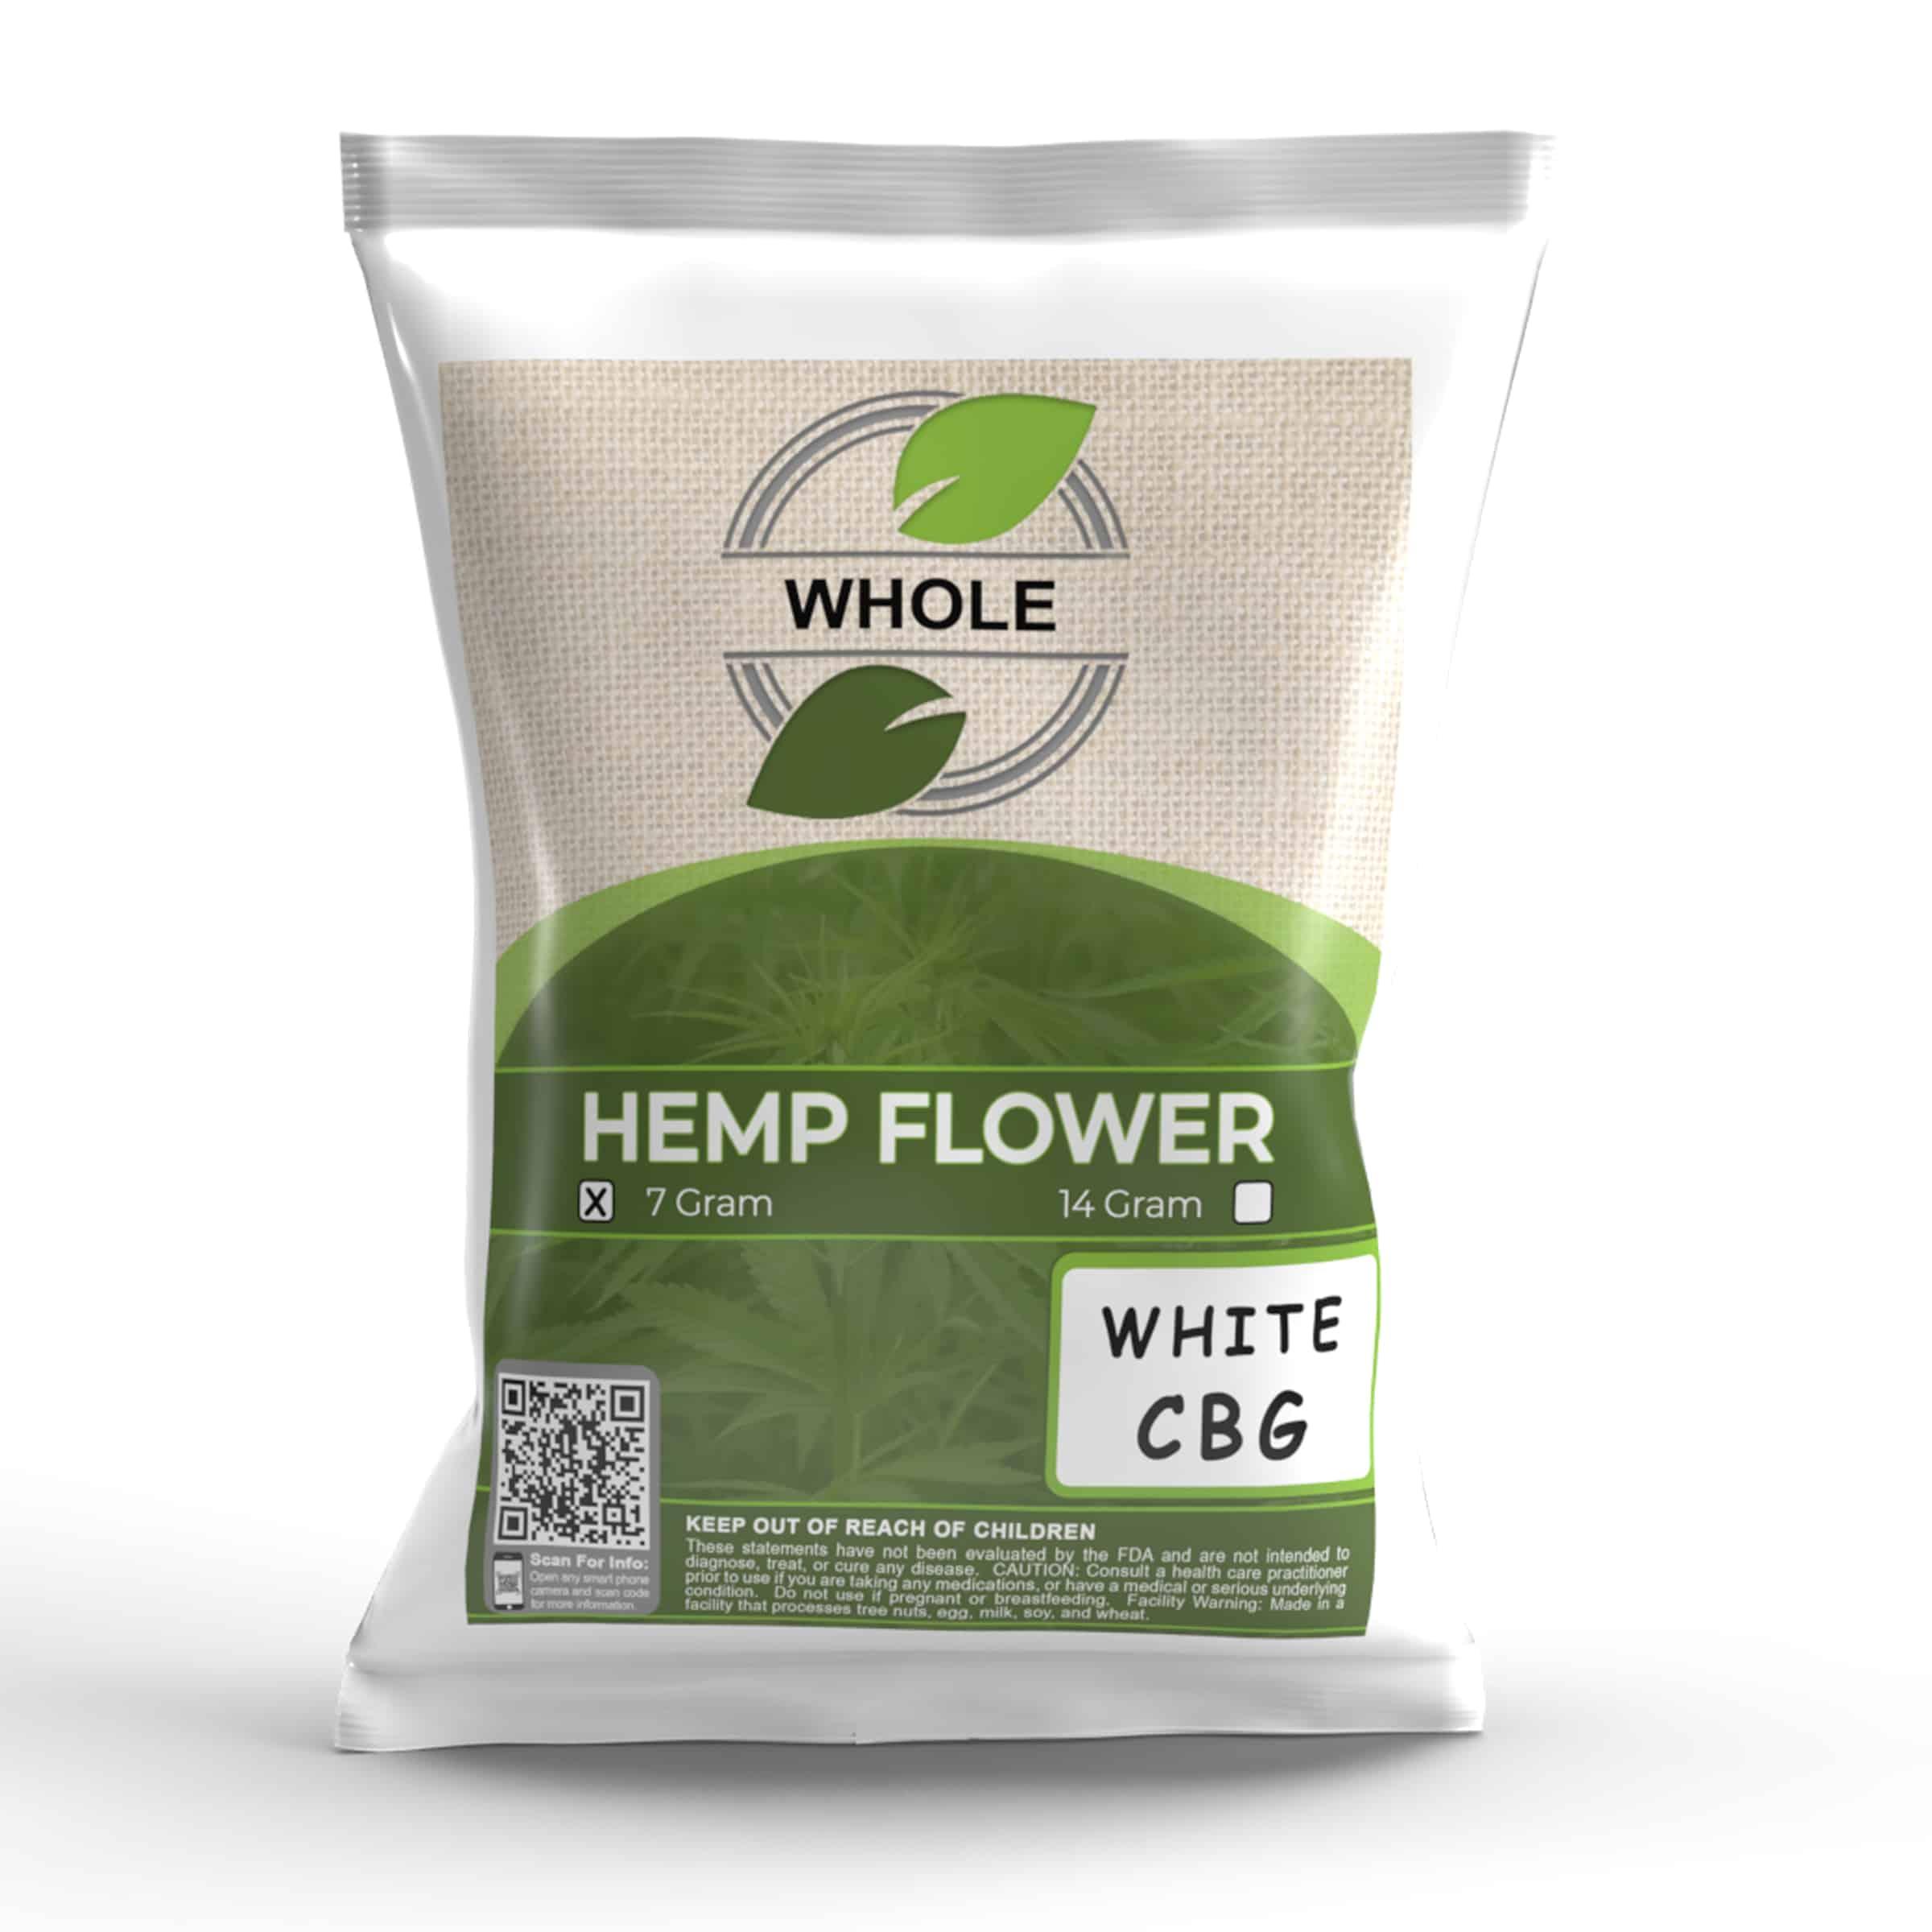 WHOLE-CBG-HEMP-FLOWER-7-GRAM